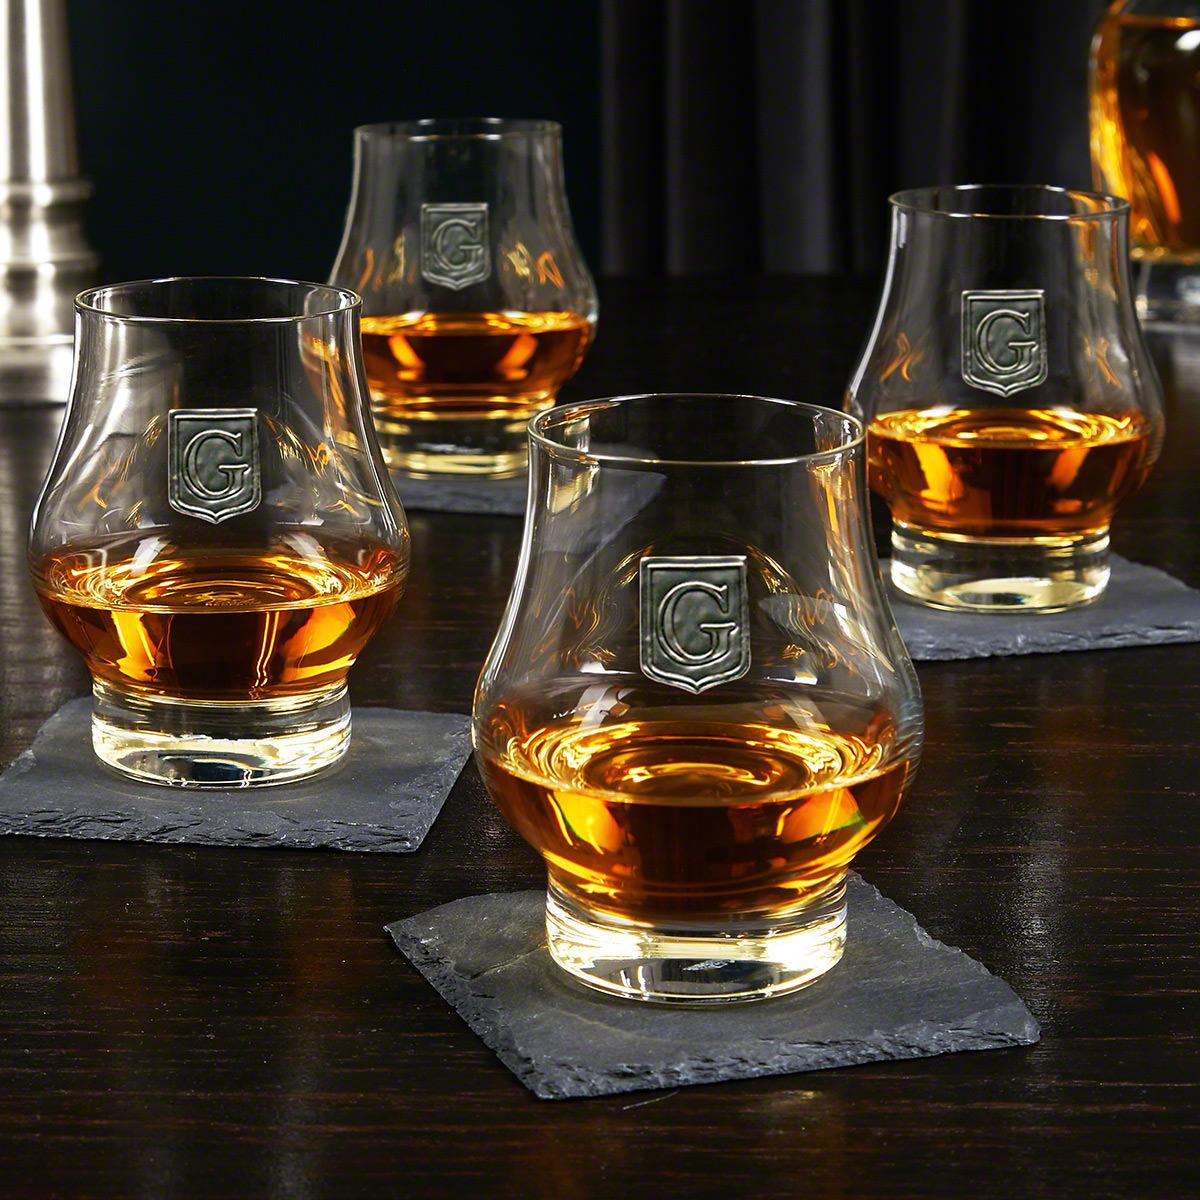 Regal Crest Custom Wescott Double Snifters Whiskey Tasting Glasses Set of 4